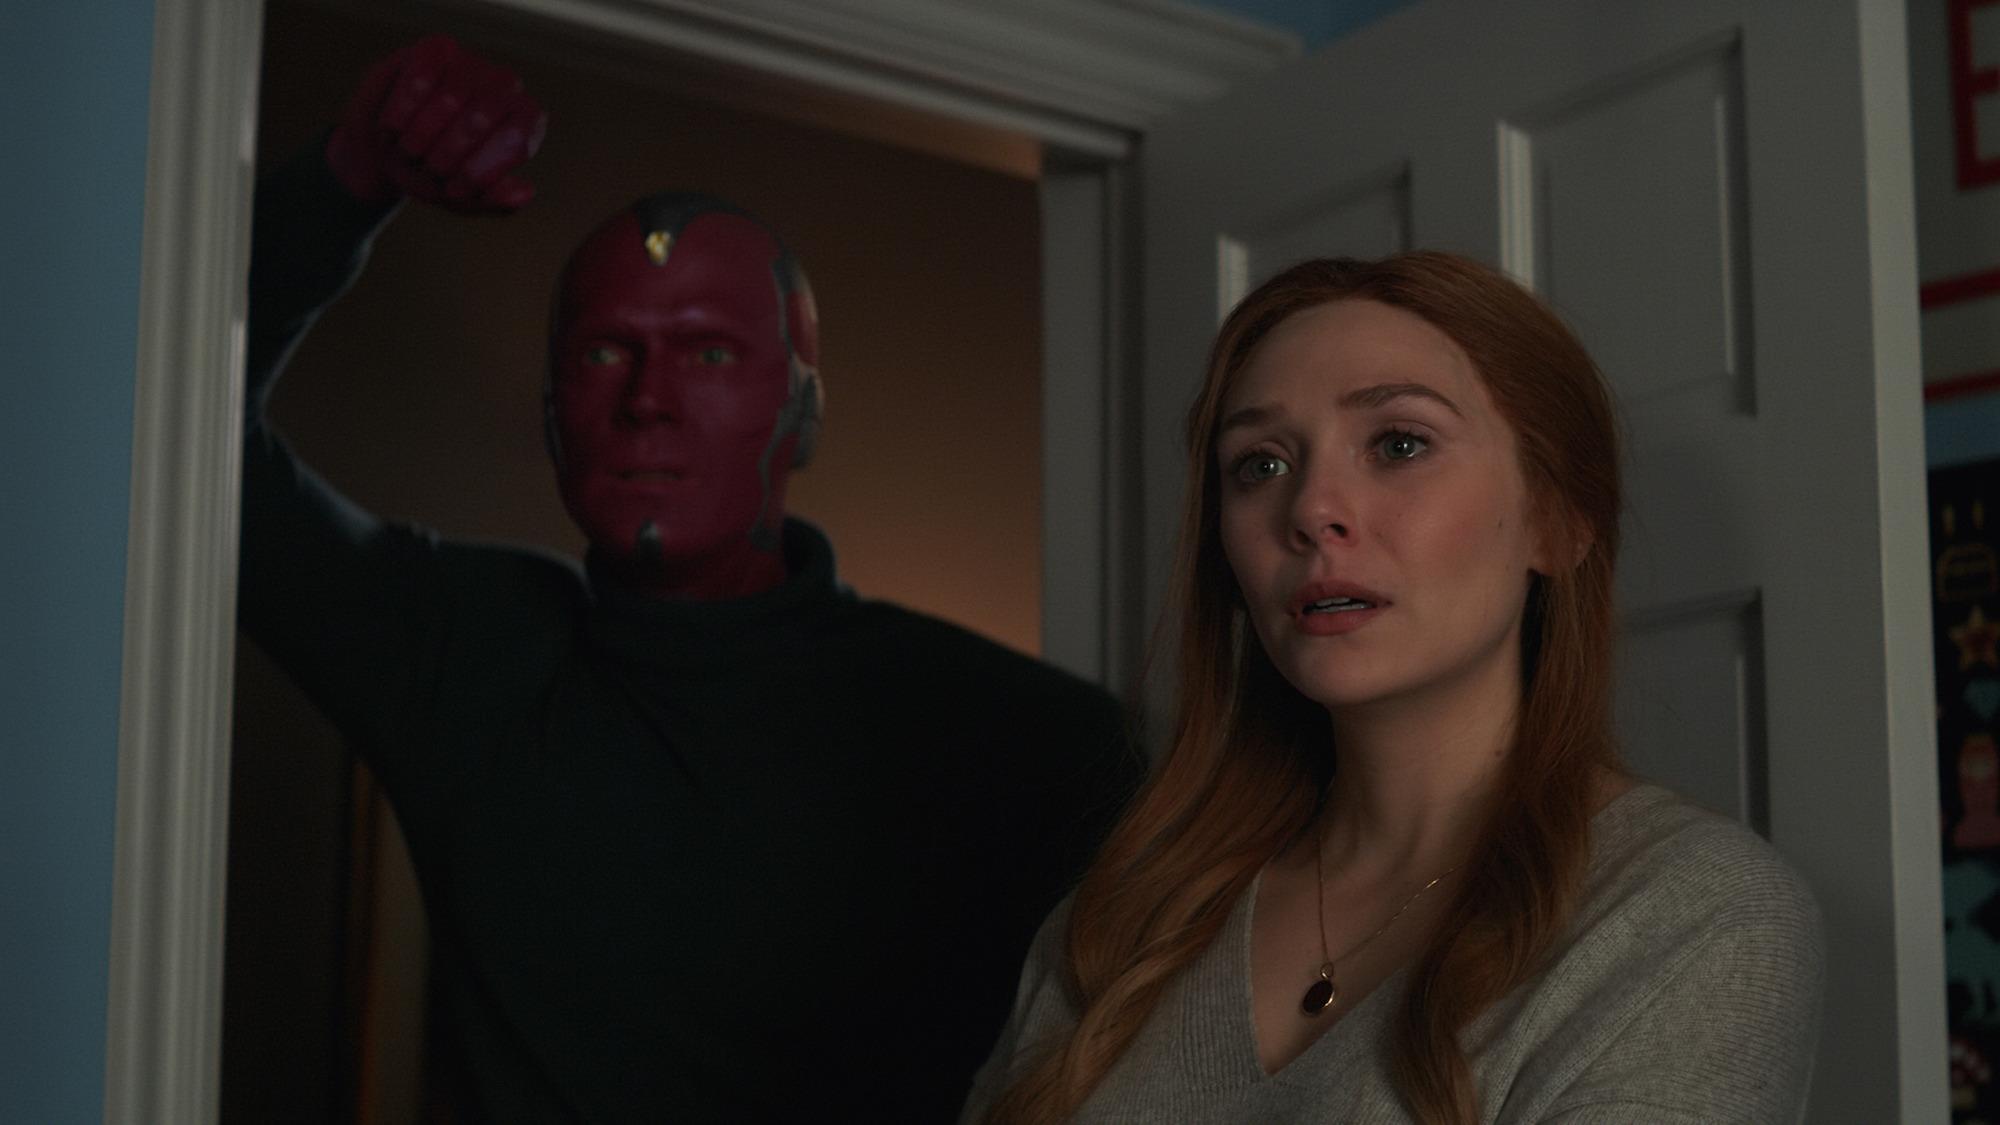 Paul Bettany as Vision and Elizabeth Olsen as Wanda Maximoff in 'WandaVision'